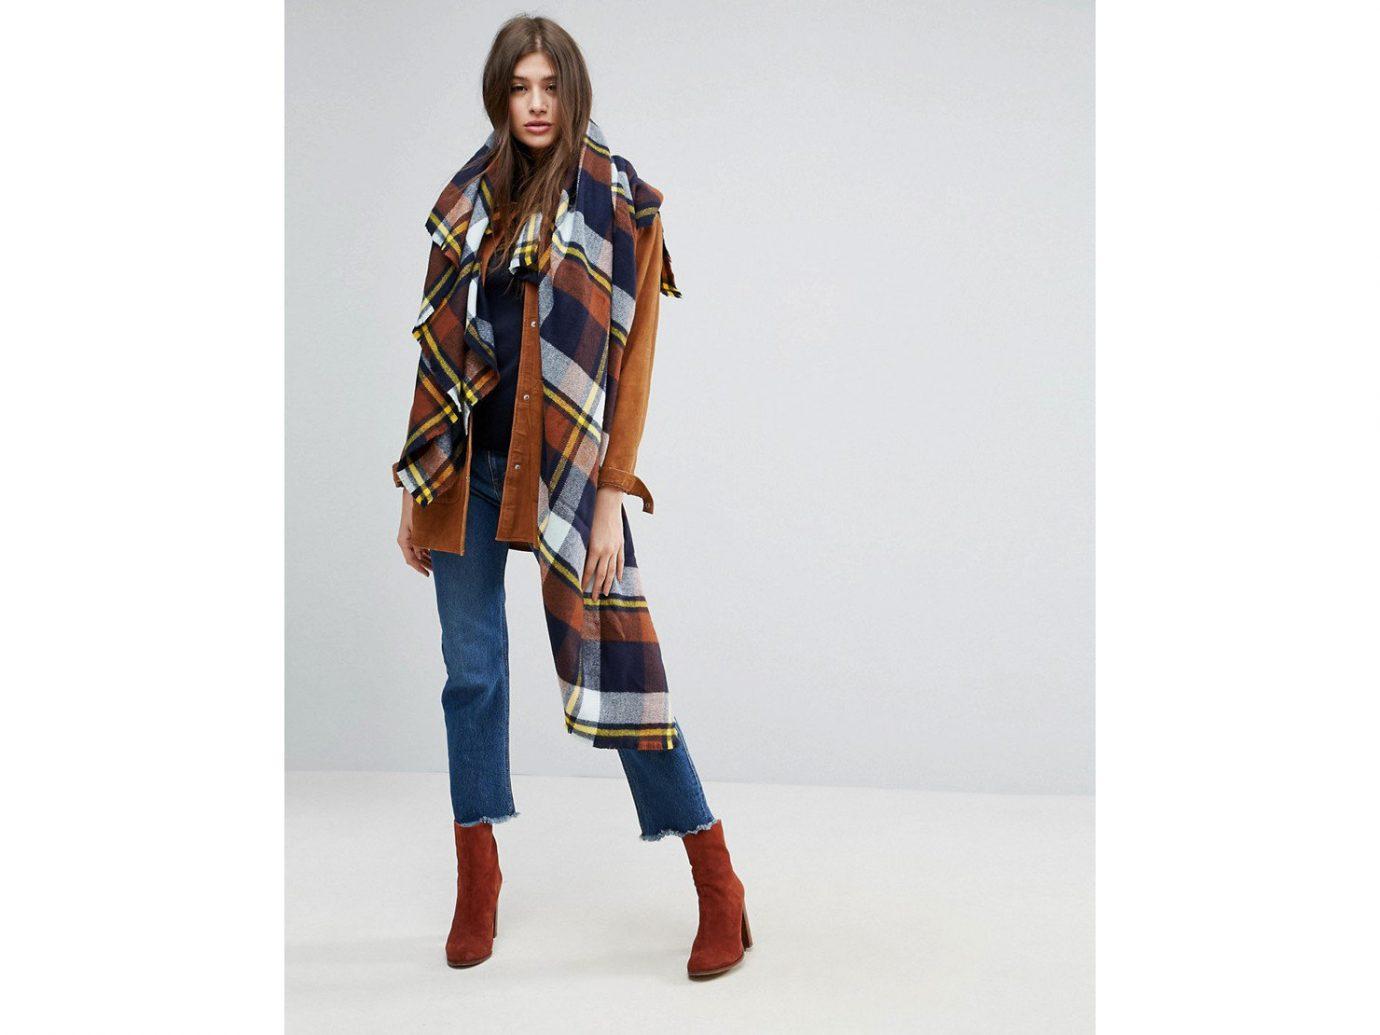 Travel Shop person fashion model shoulder outerwear fashion pattern tartan joint costume